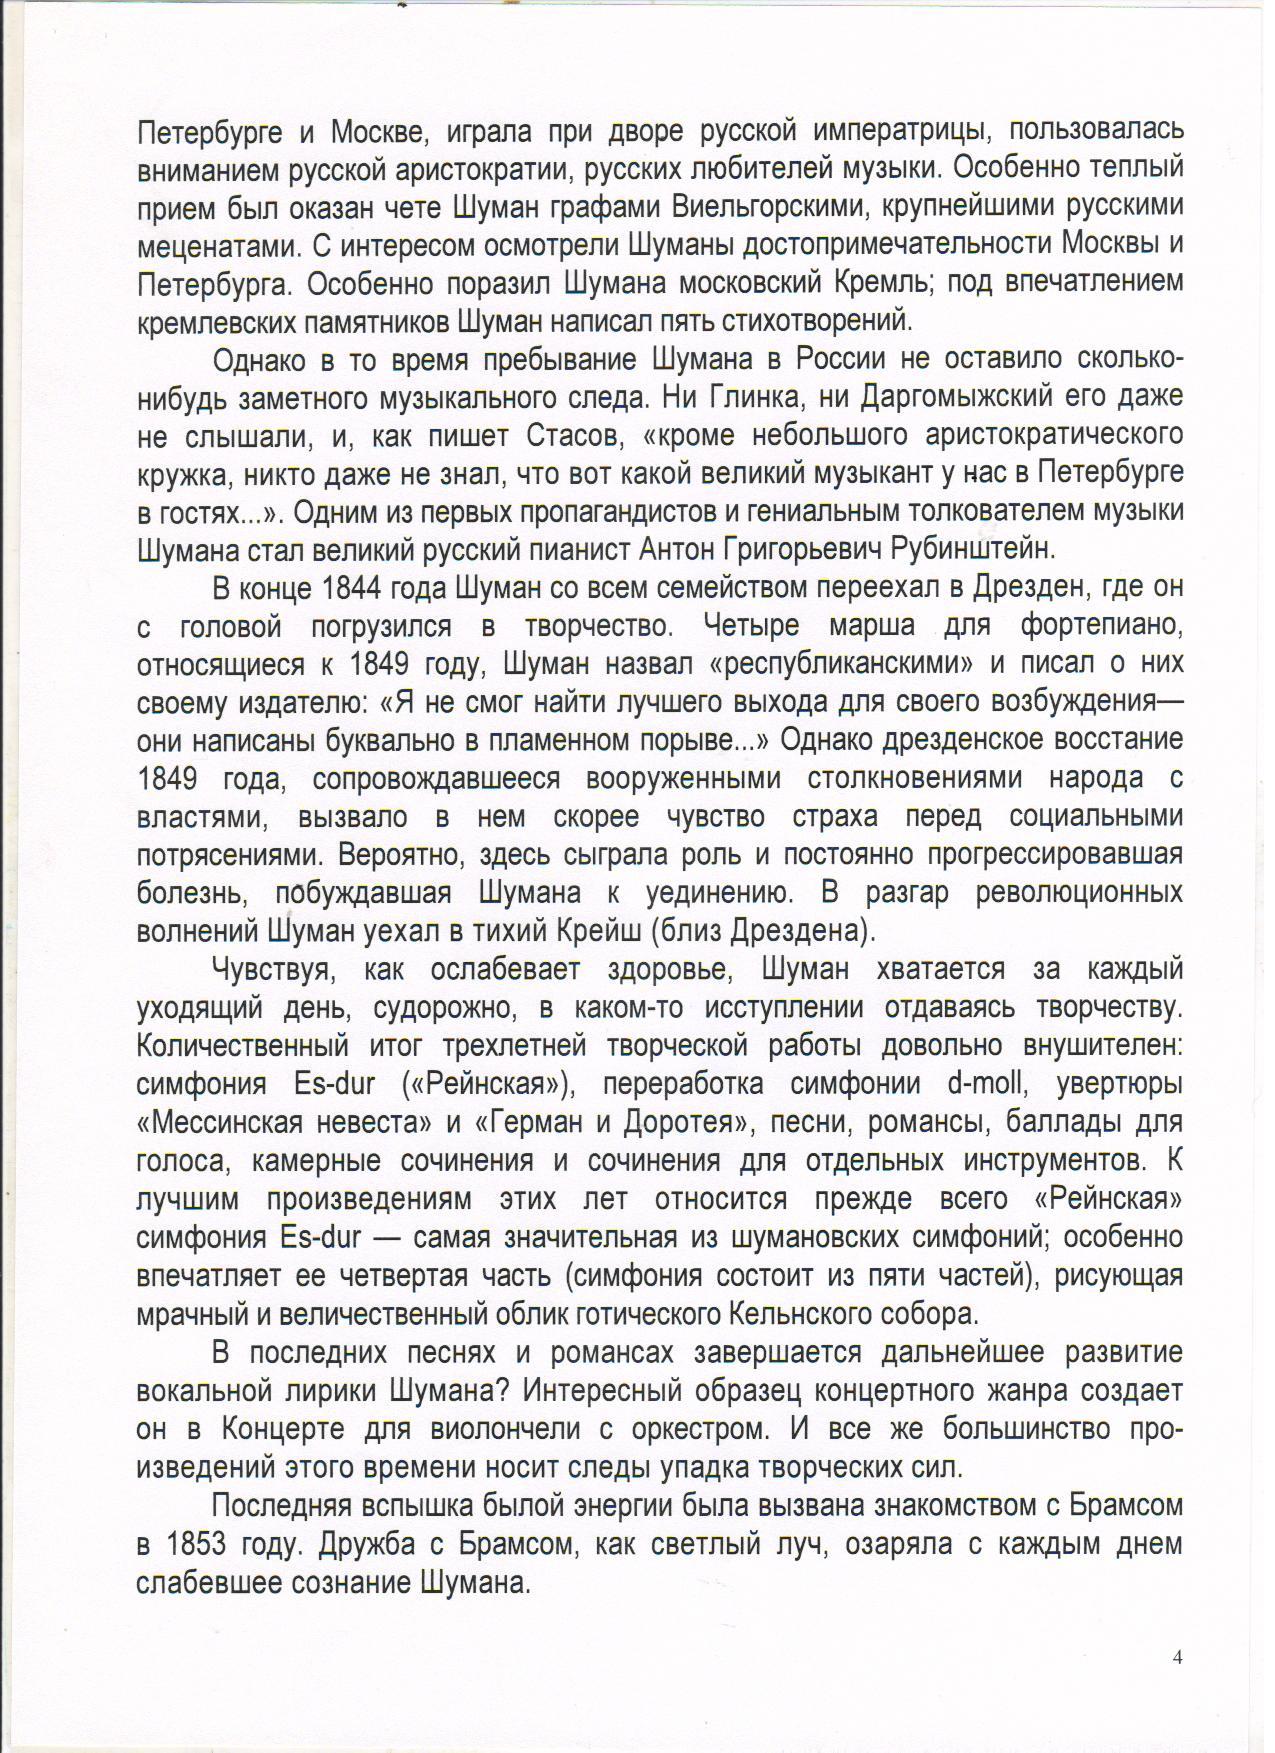 C:\Documents and Settings\Учитель\Рабочий стол\Шуман 4.jpg